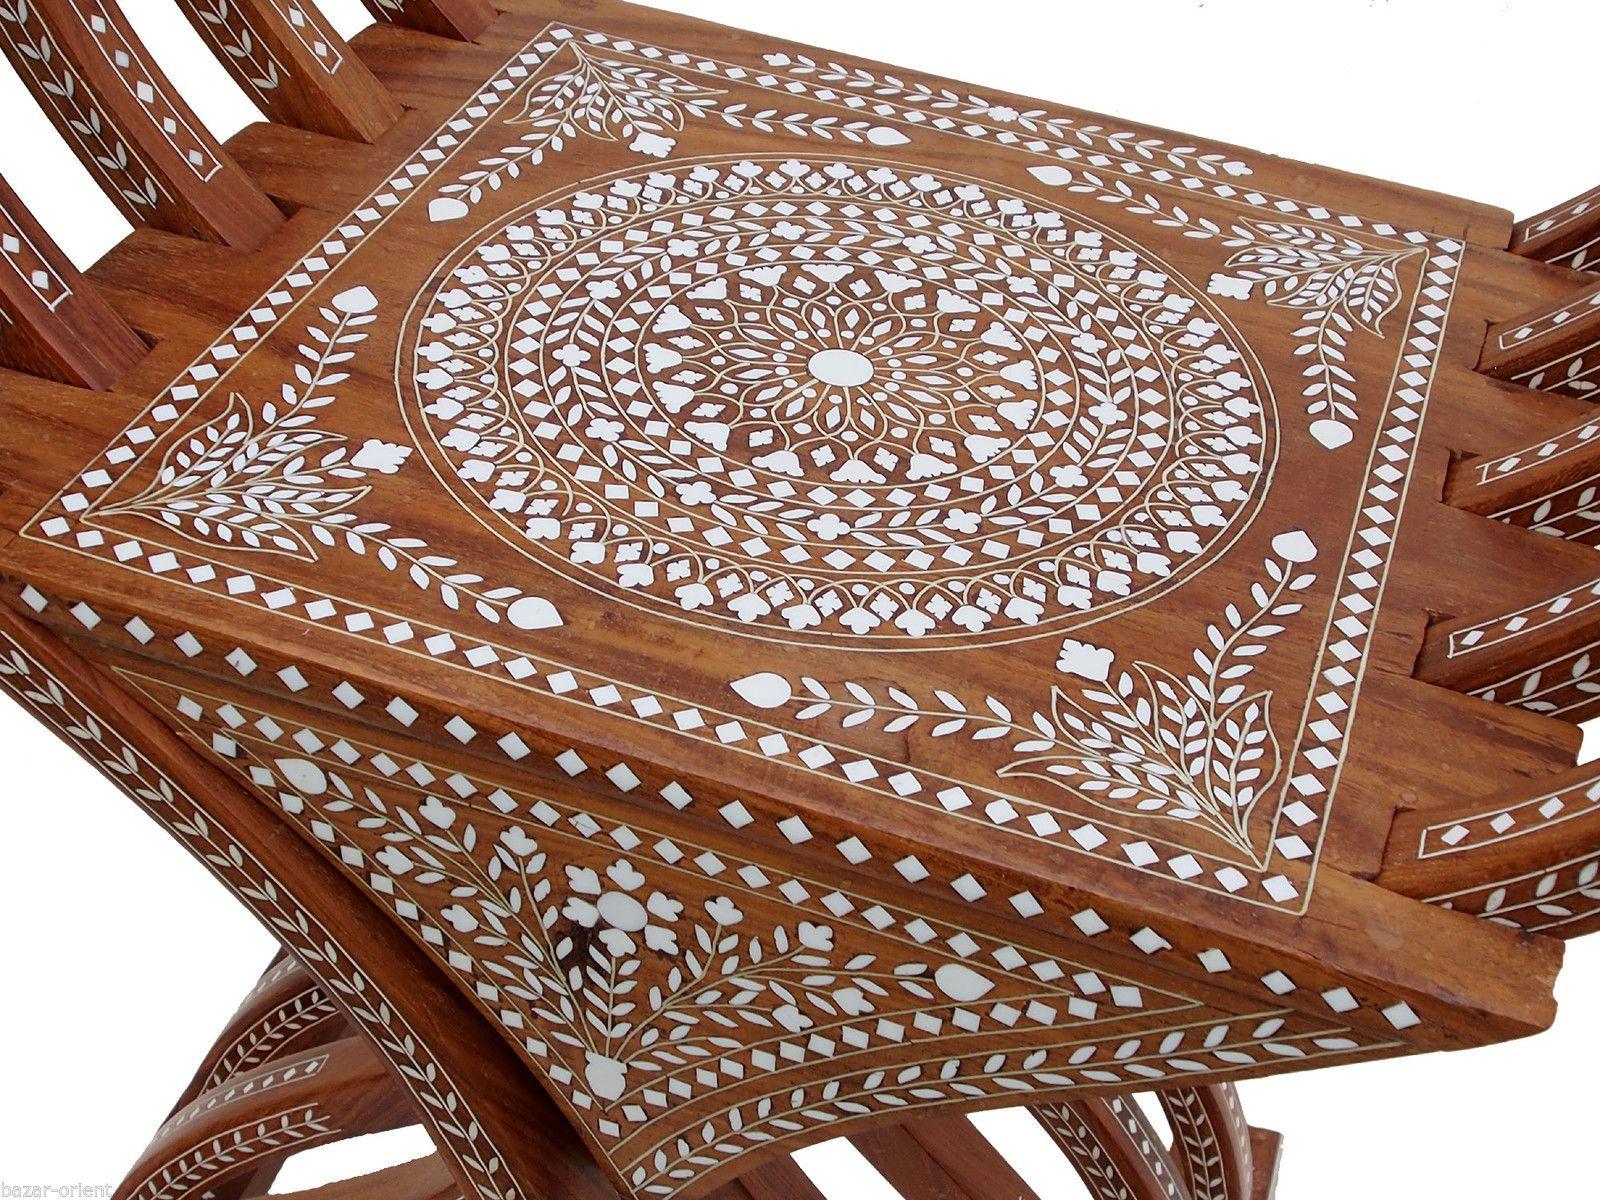 antik luxuriöse orient Stuhl Intarsien antique india Anglo Savonarola chair | eBay